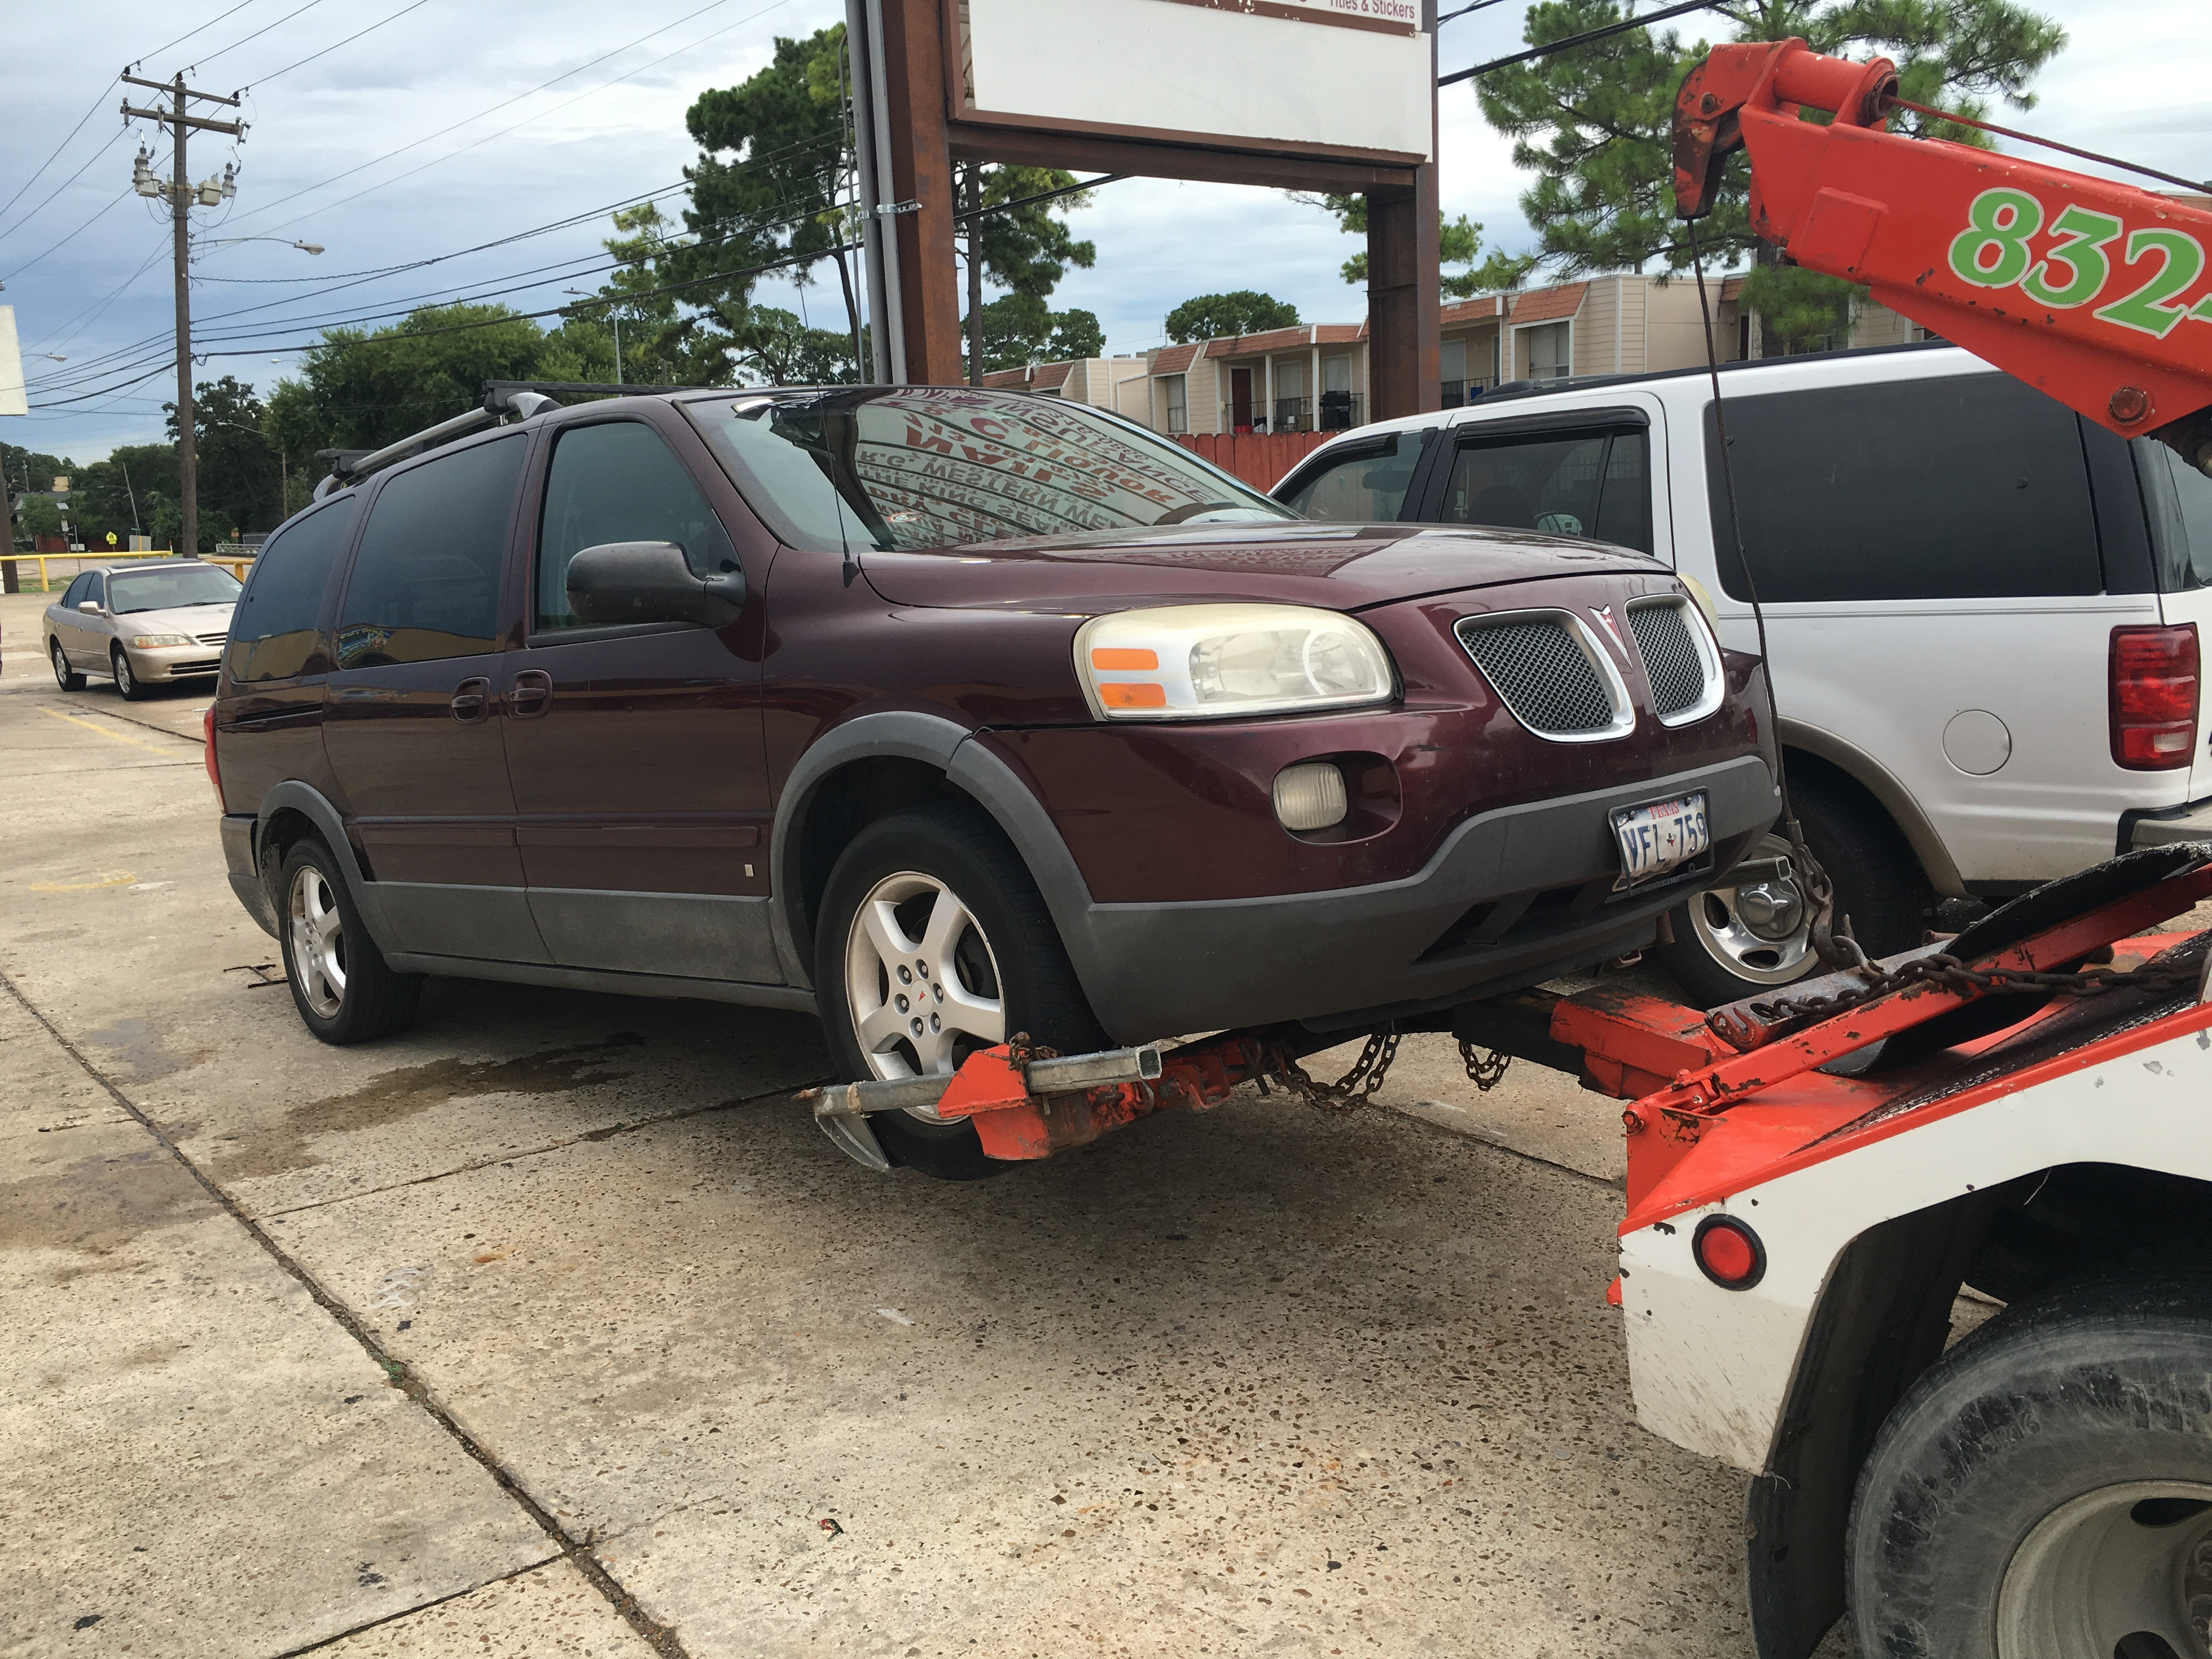 We Love Broken Down Vehicles - Get Free Towing Today!